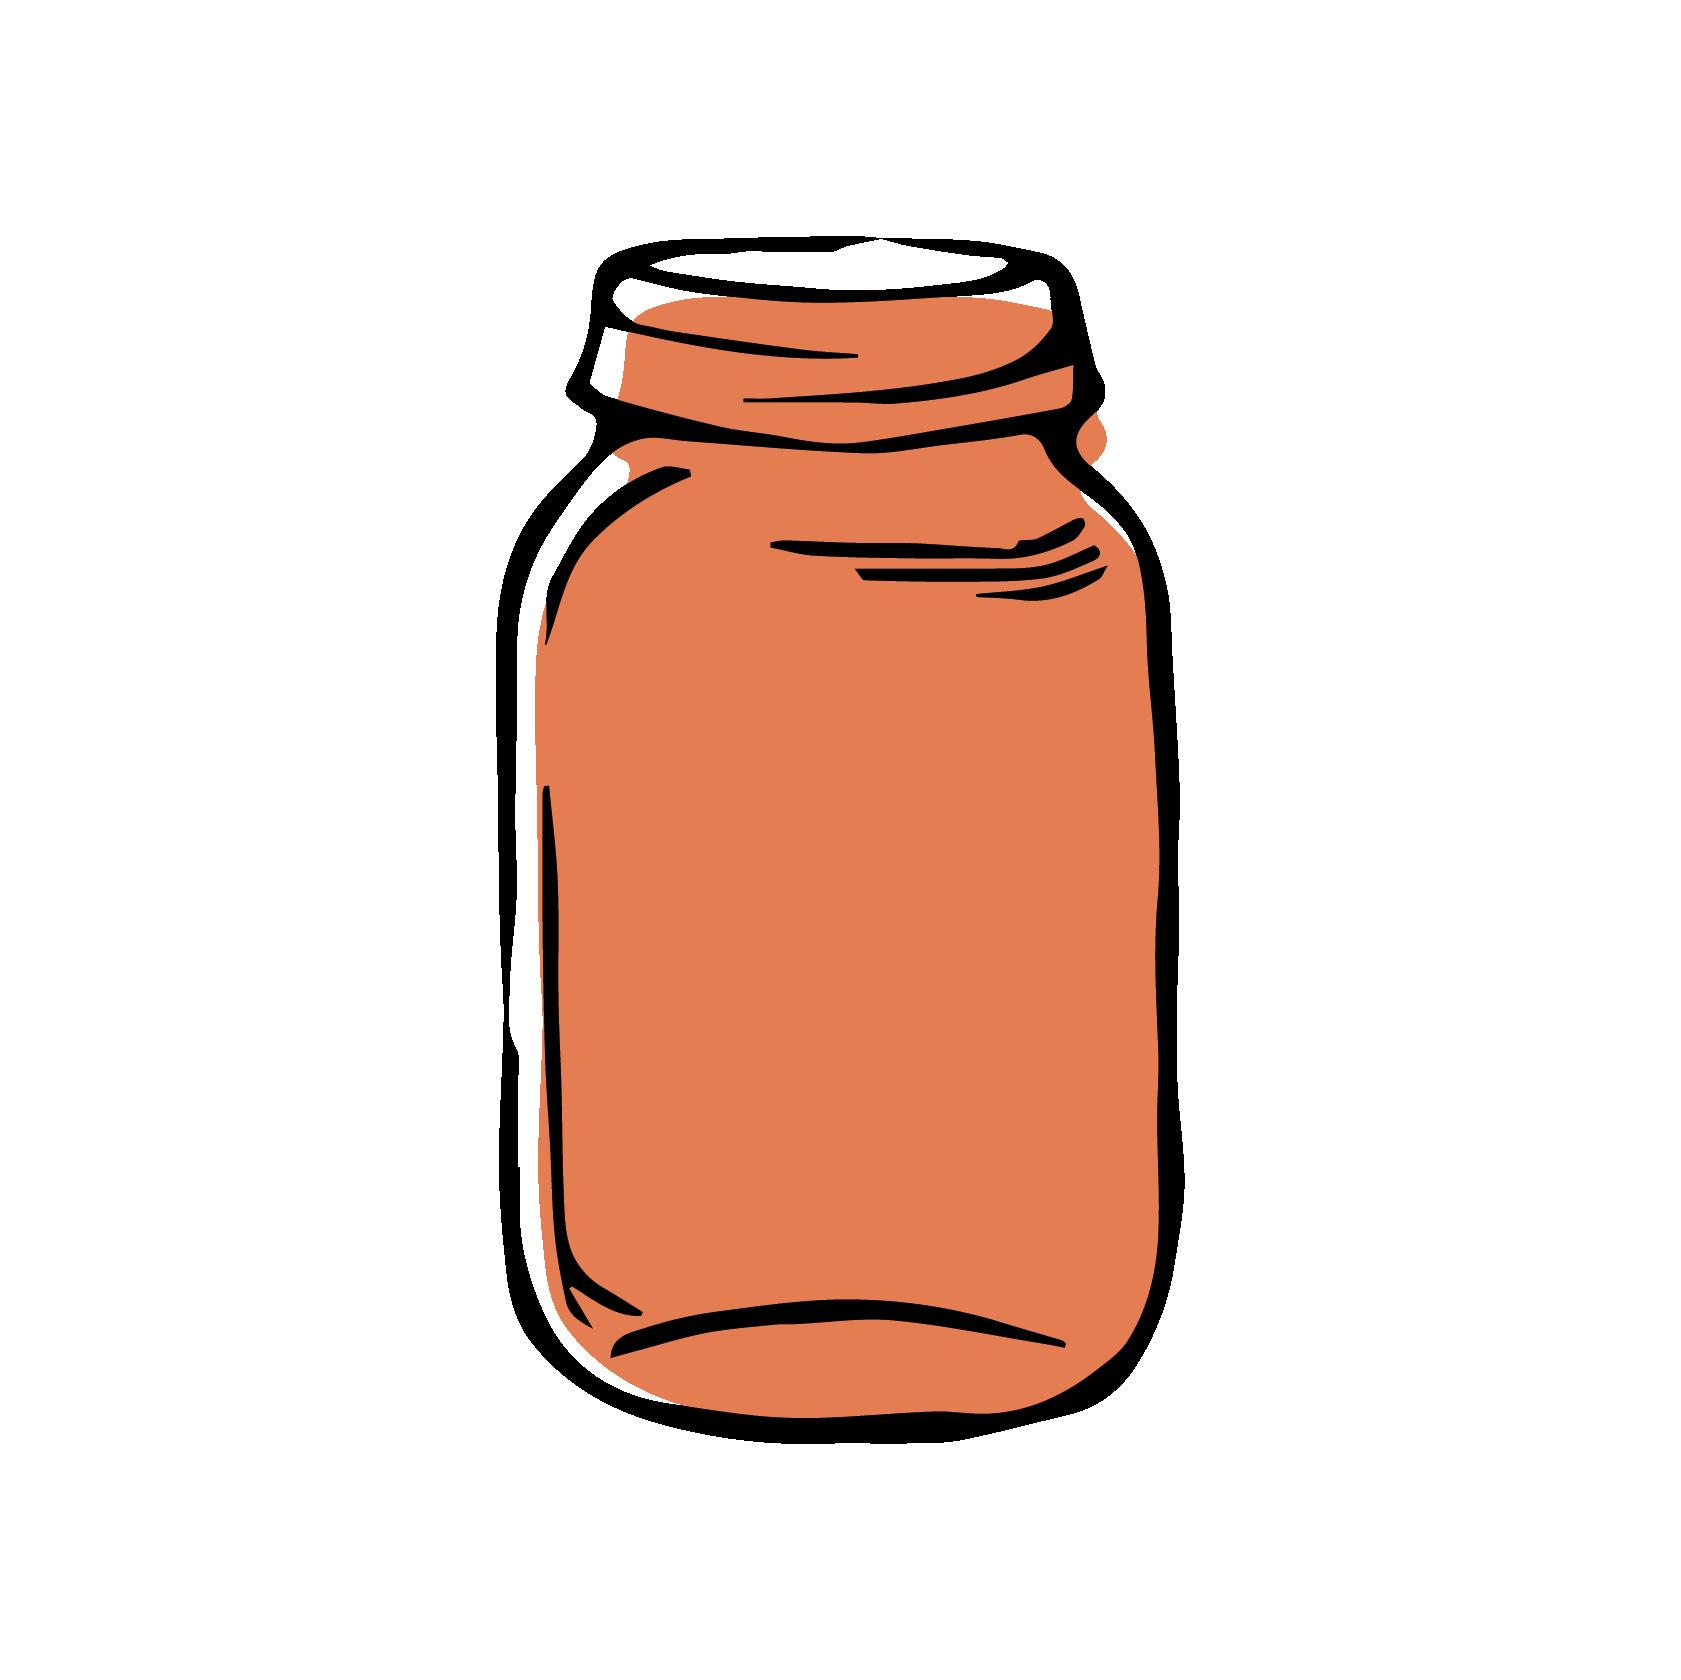 2. Reduce the amount of waste you produce -